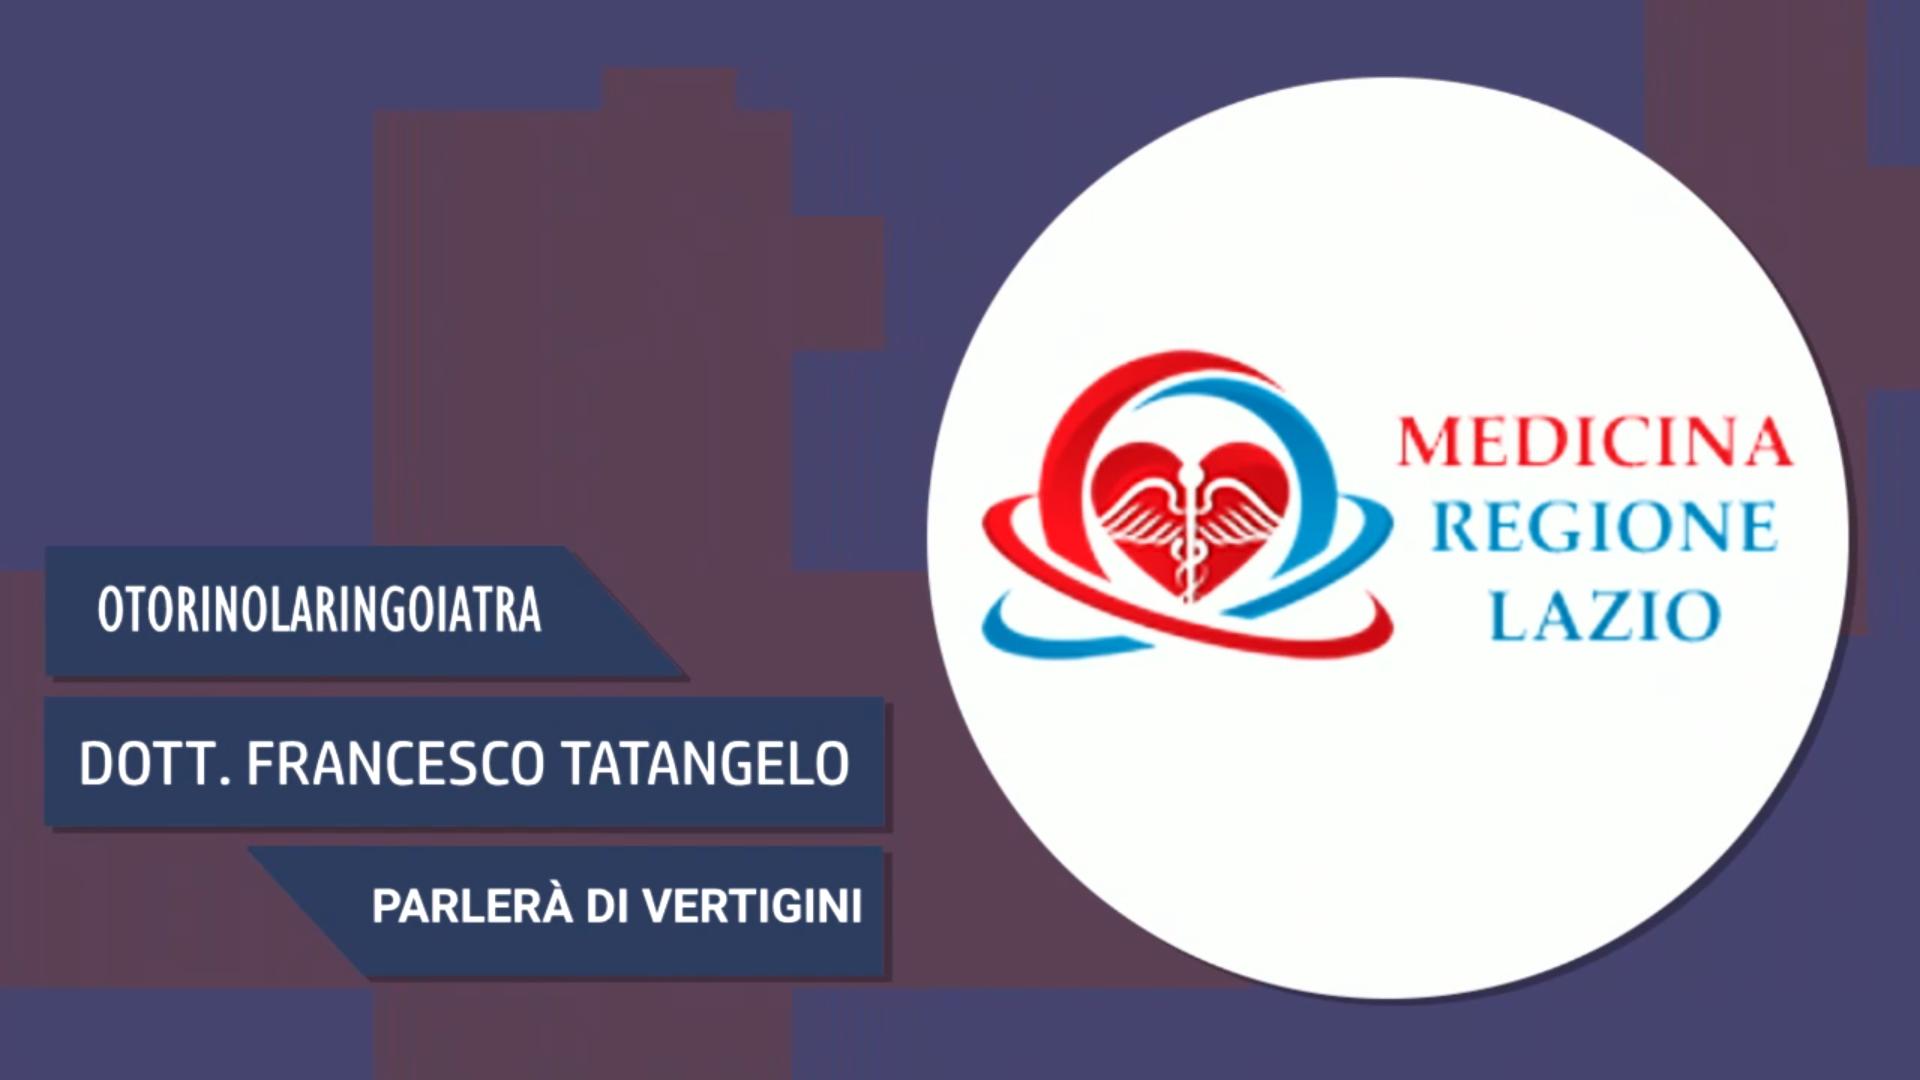 Intervista al Dott. Francesco Tatangelo – Parlerà di vertigini